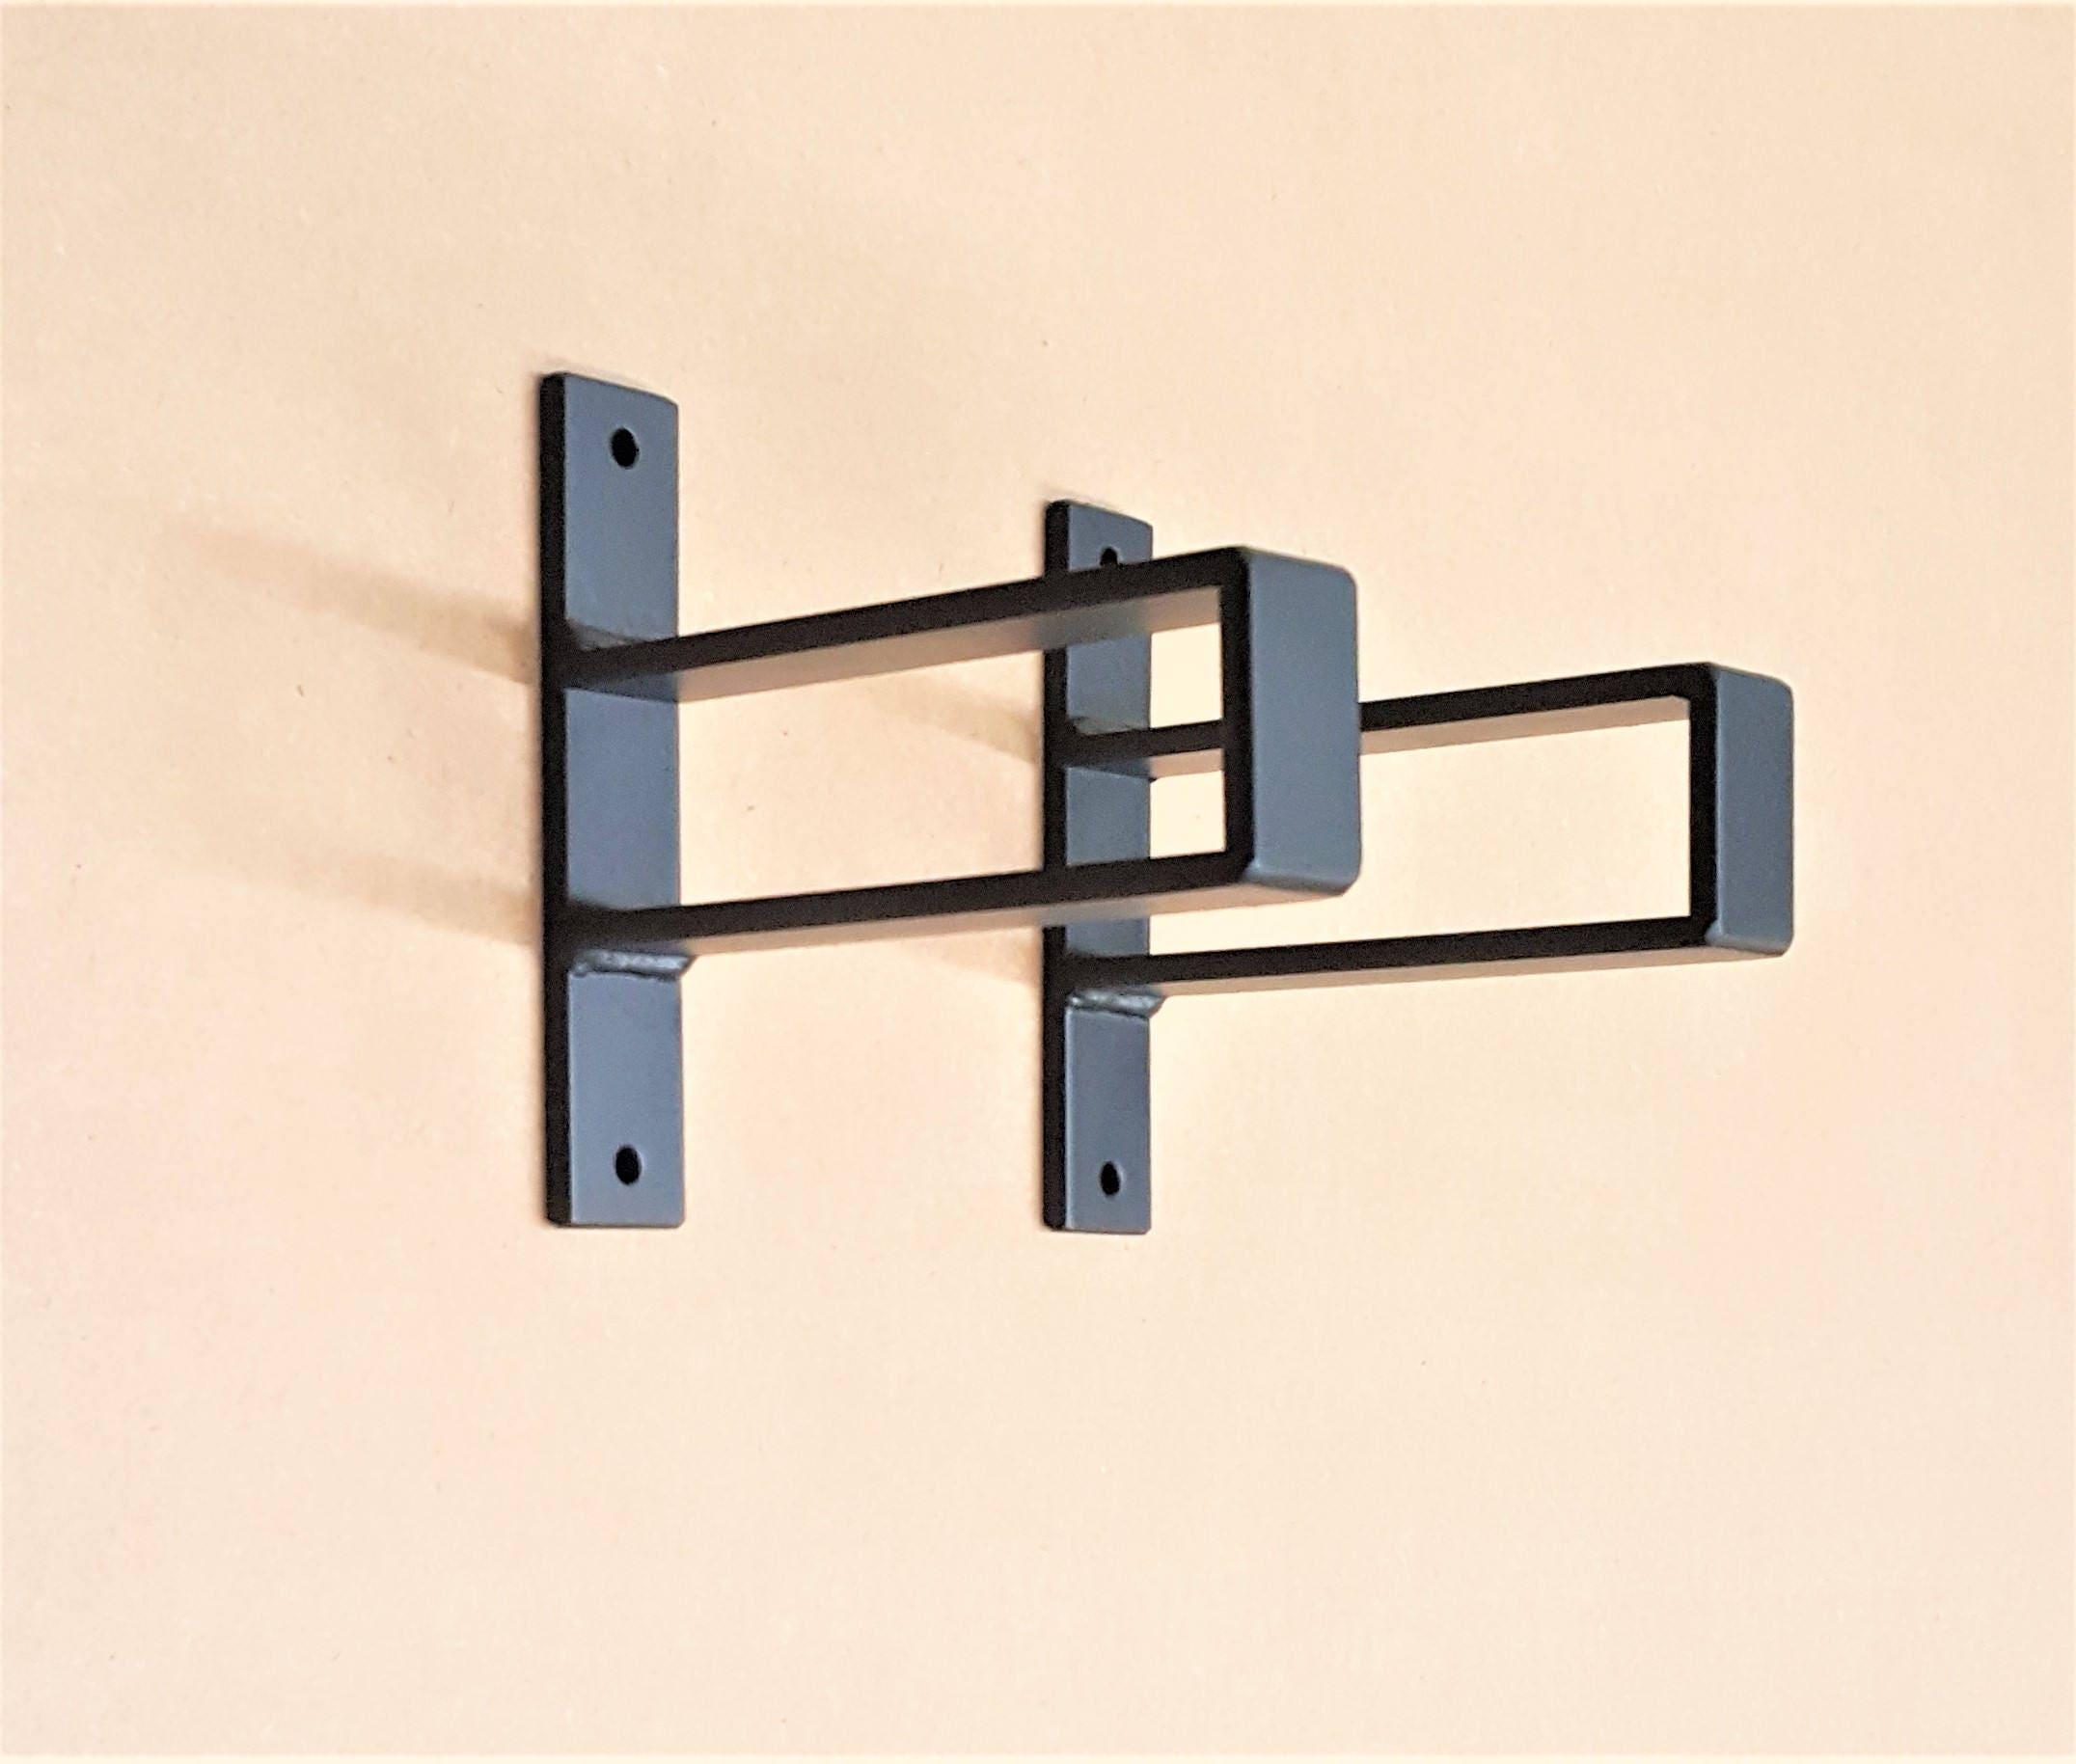 bracket shelf zoom il steel fullxfull listing brackets industrial mnrs